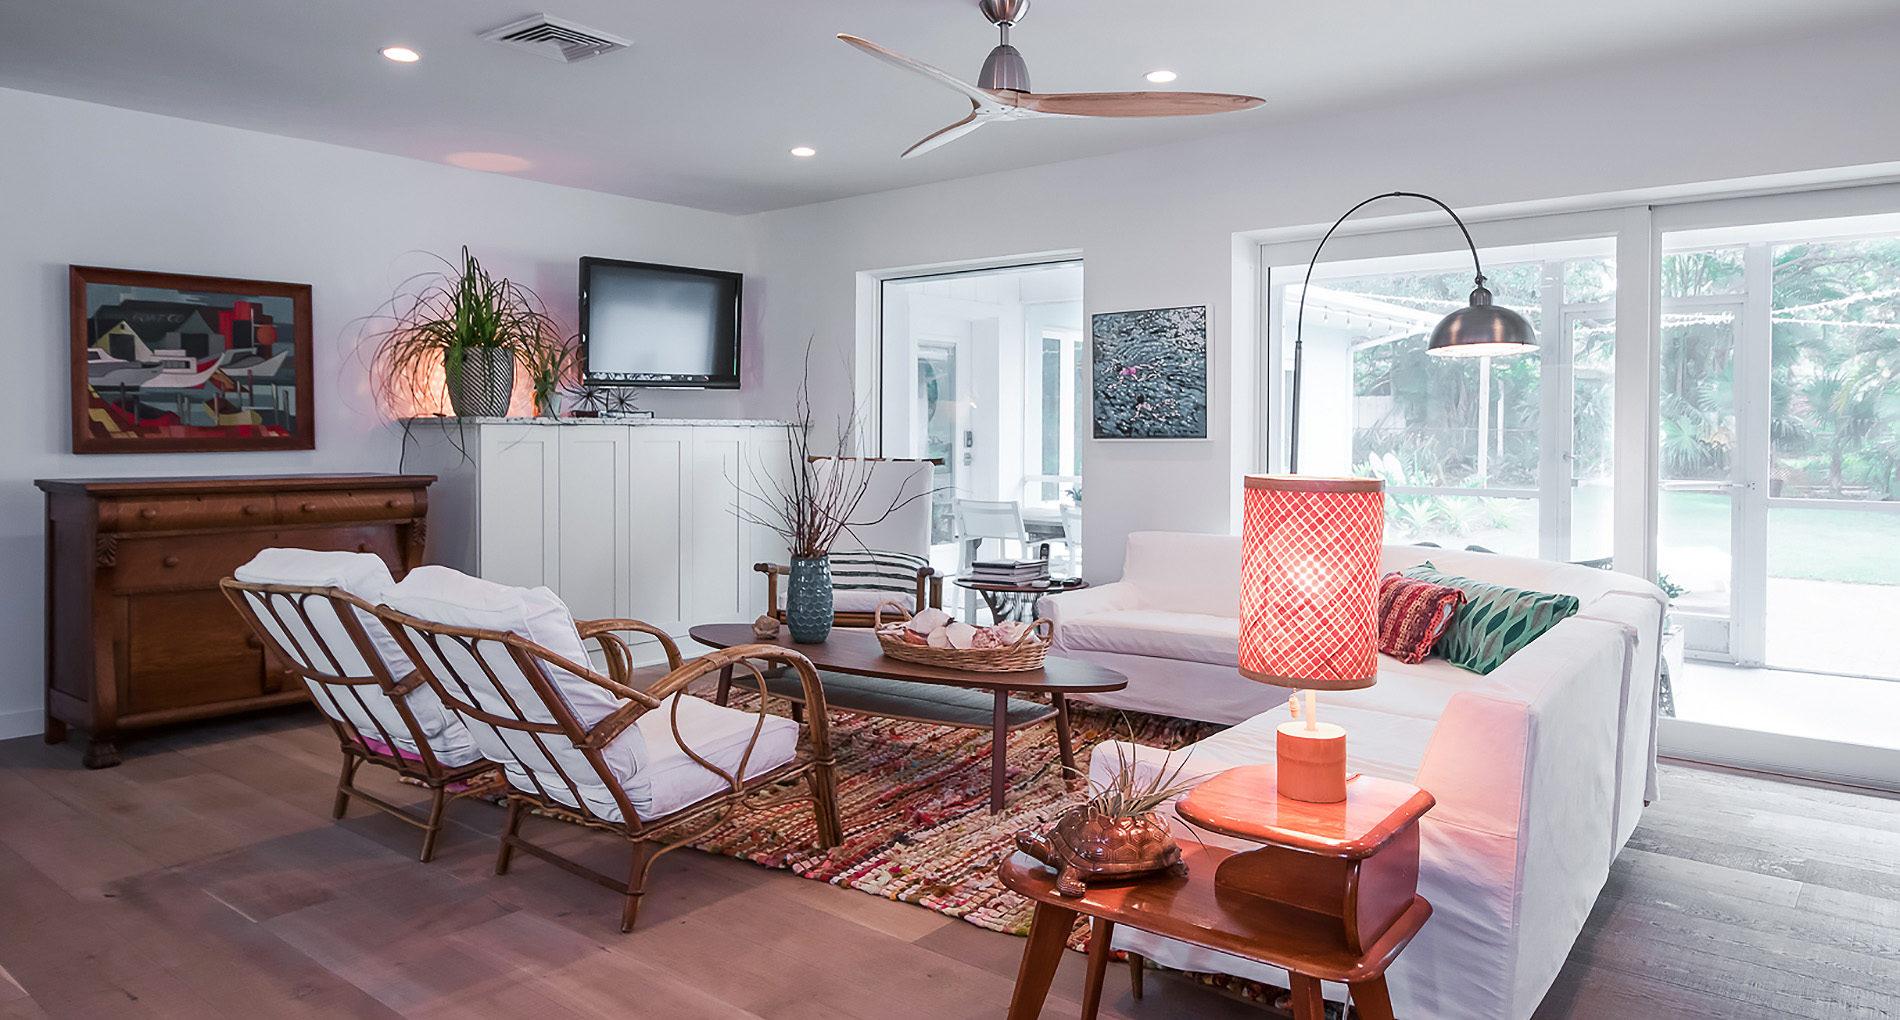 Home Remodel Orlando Gasparilla Slider2